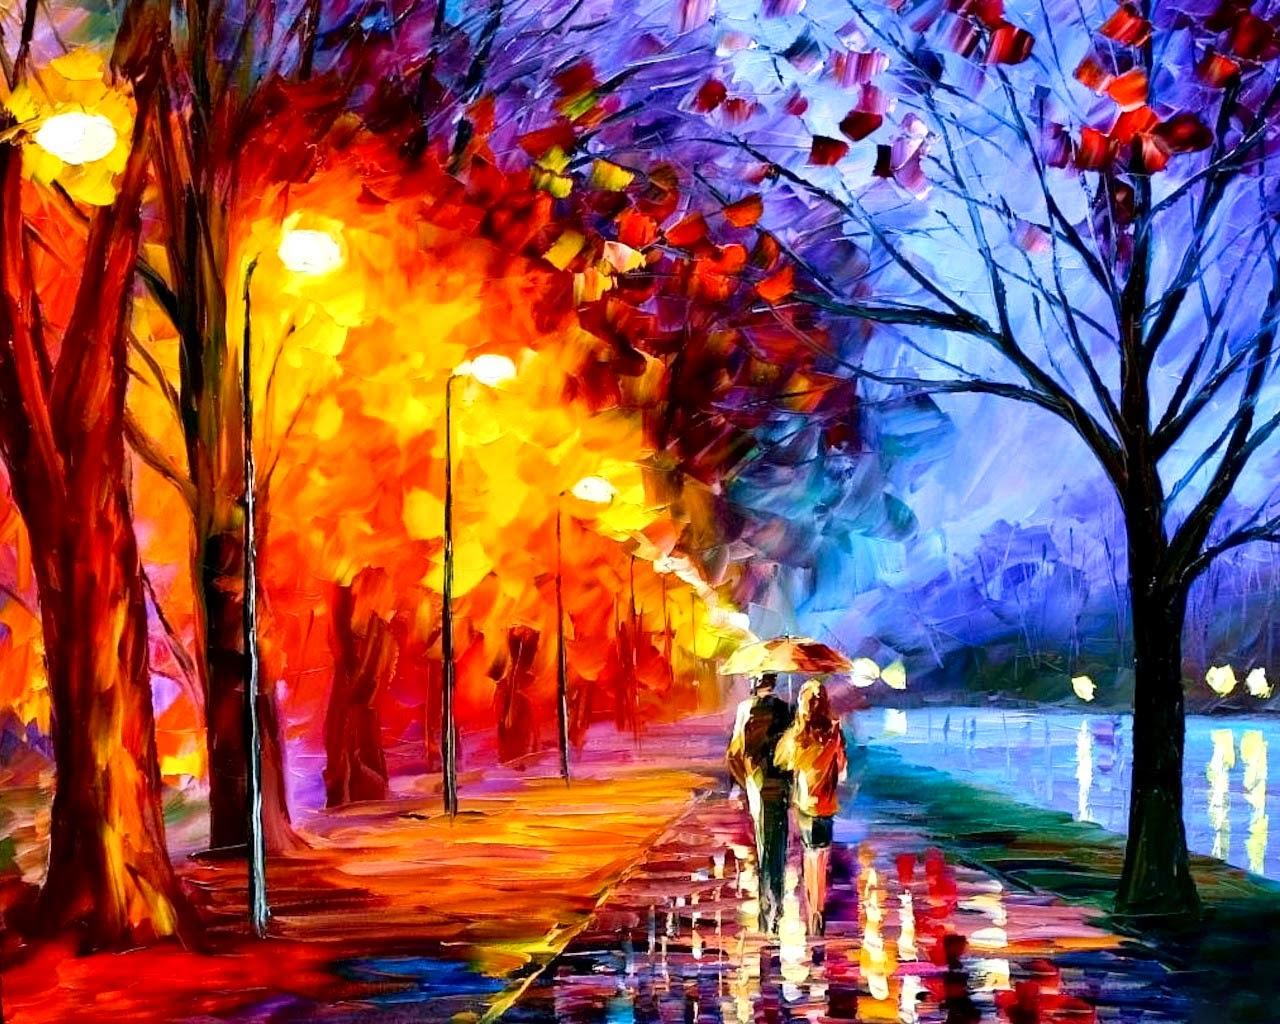 Beautiful 3d Oil Painting For Desktop Hd Wallpapers